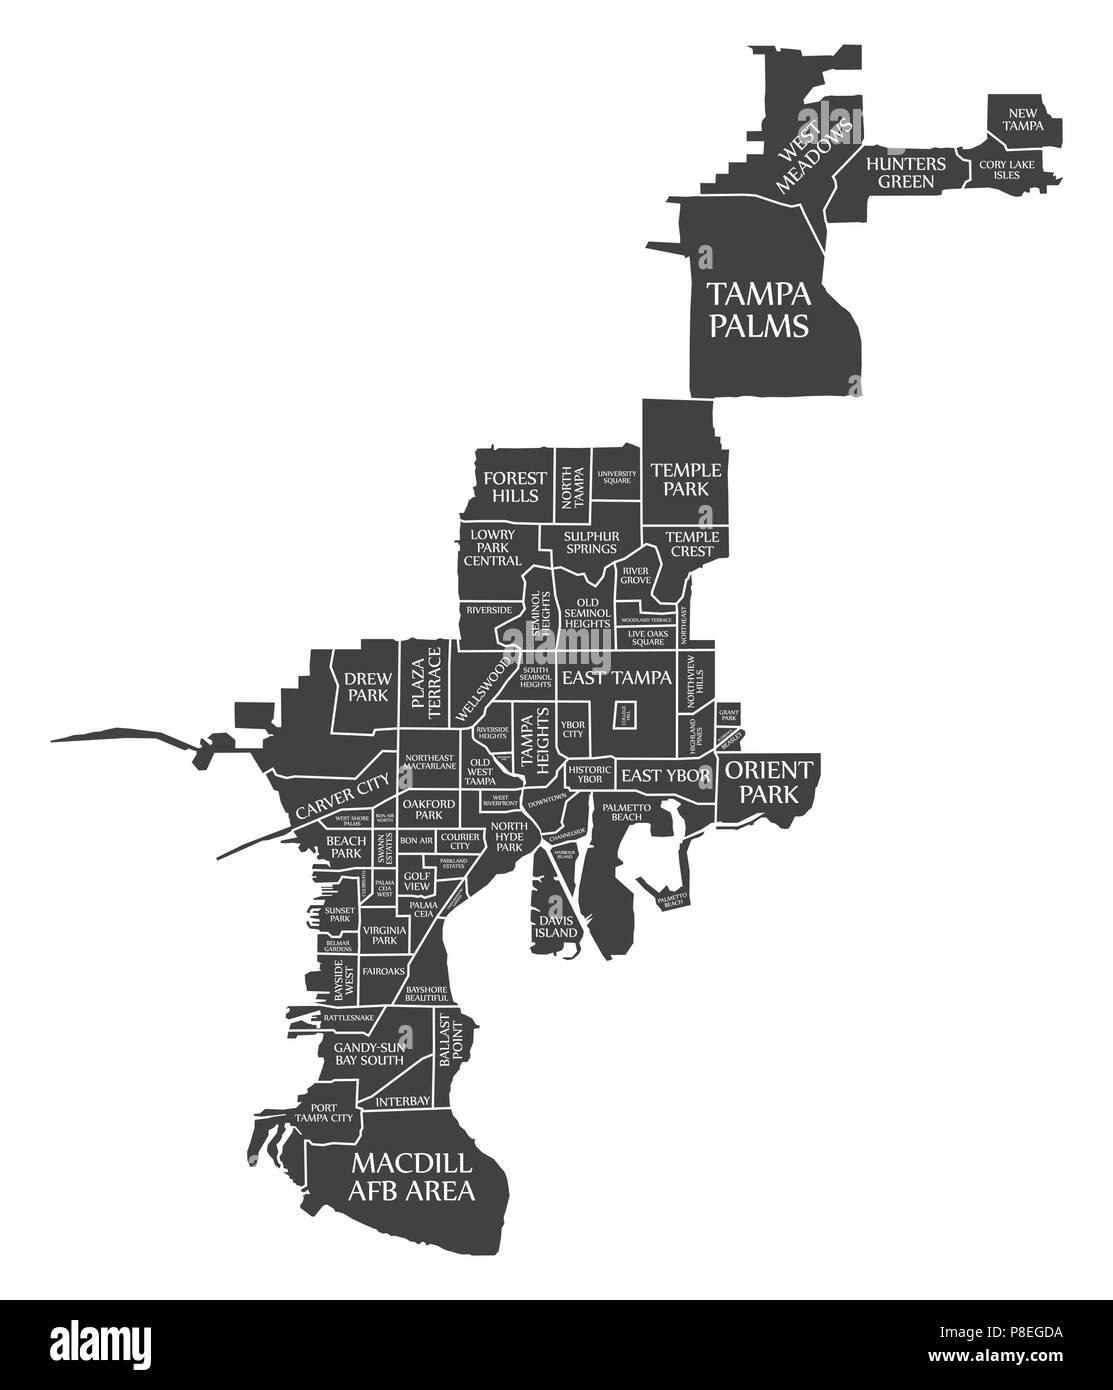 Tampa Florida On Map.Tampa Florida City Map Usa Labelled Black Illustration Stock Vector